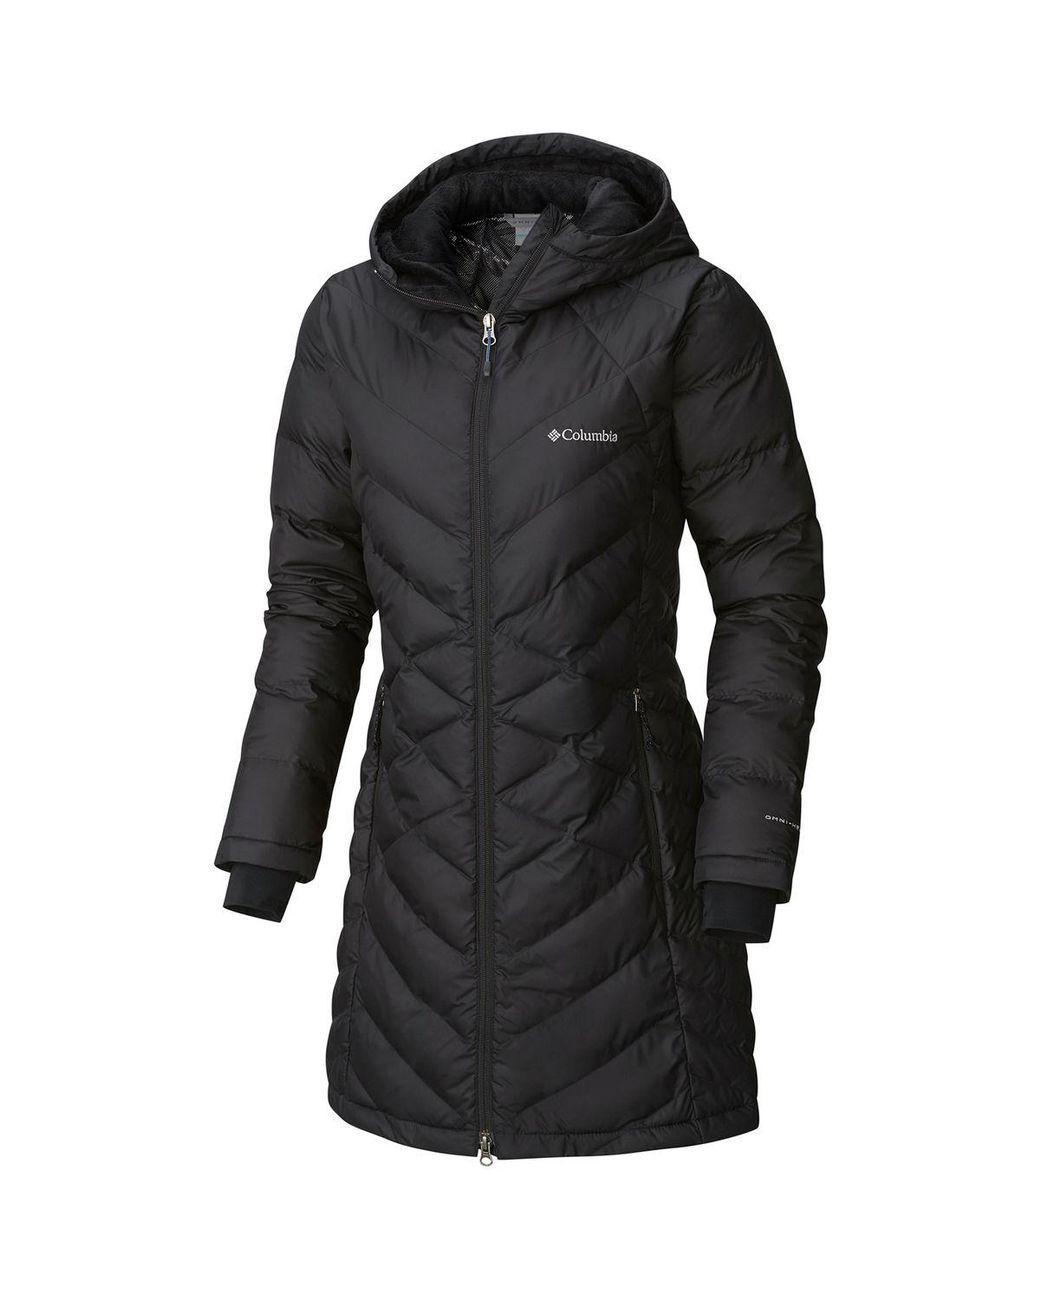 8fc470fb9b9 Columbia Heavenly Long Hooded Jacket in Black - Save 35% - Lyst